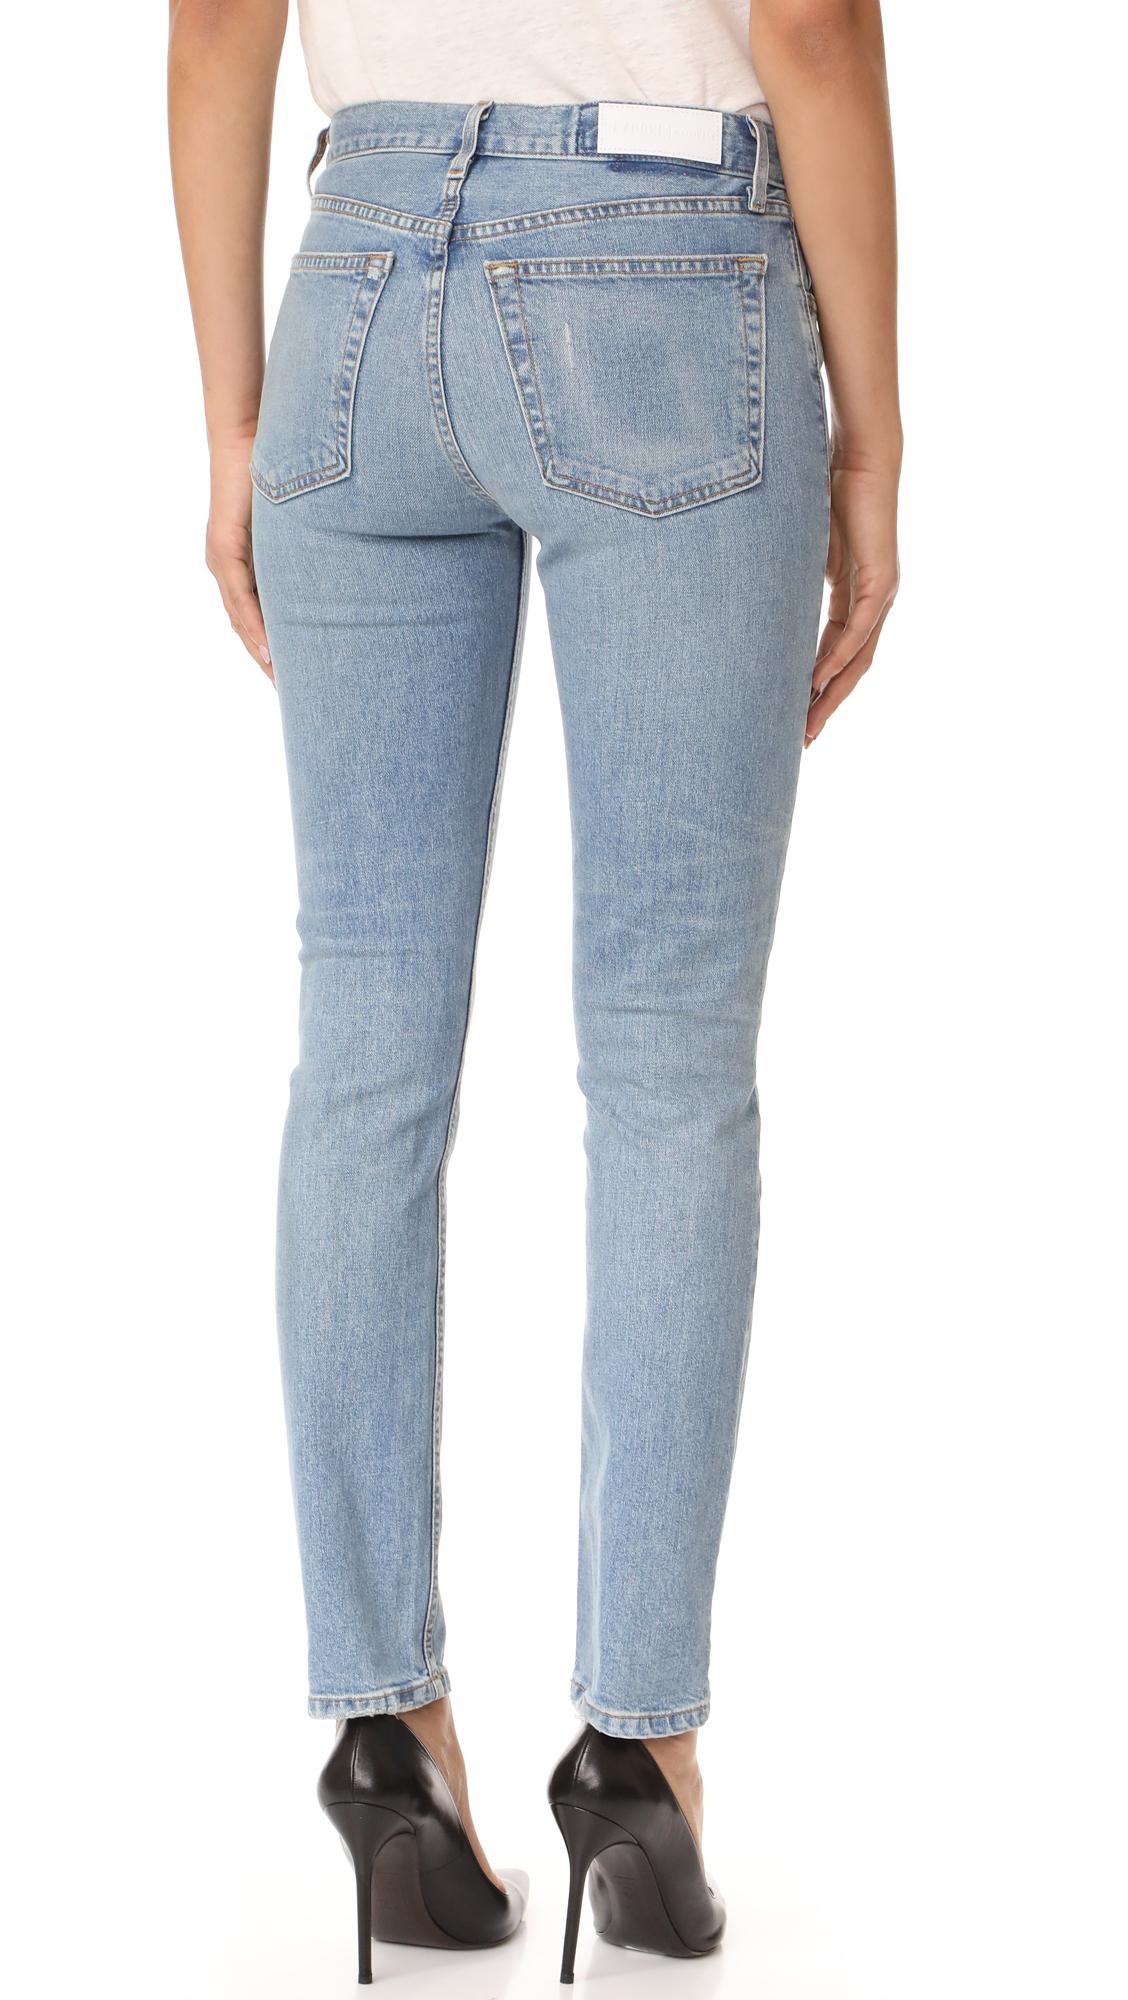 39f4651317d8e RE DONE Originals Stretch Straight Skinny Jeans